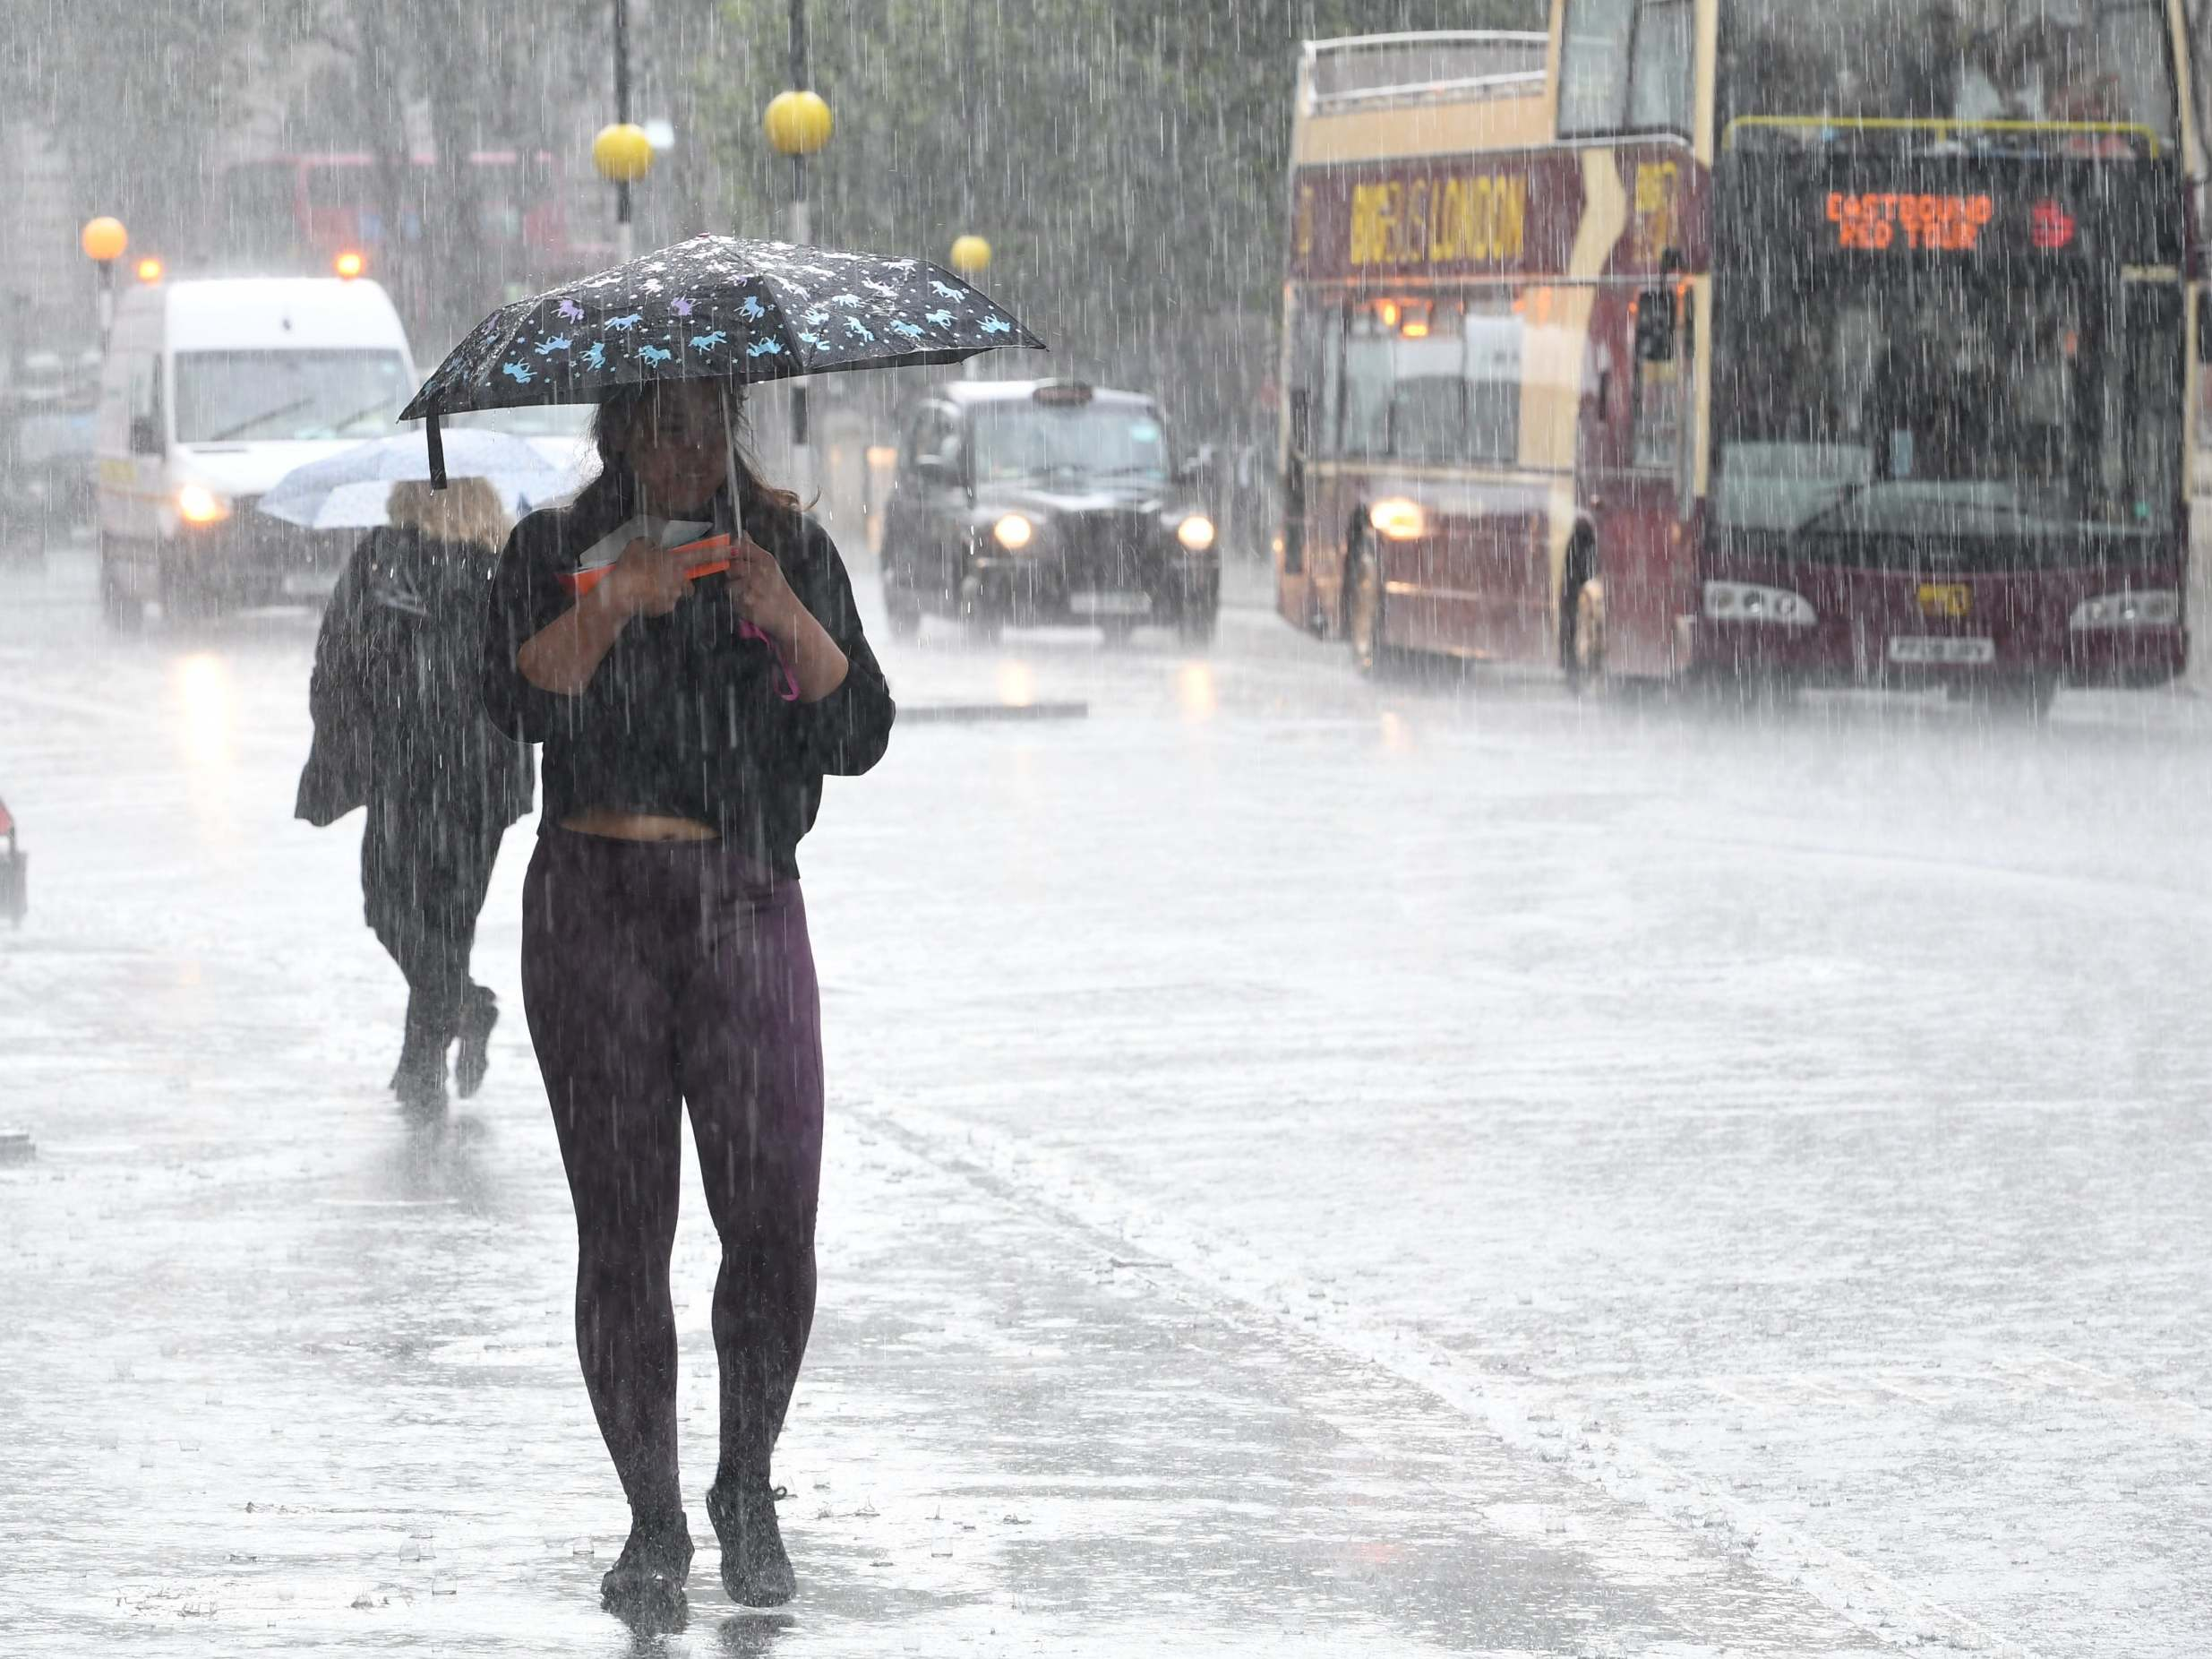 UK weather forecast: Temperatures to plummet as